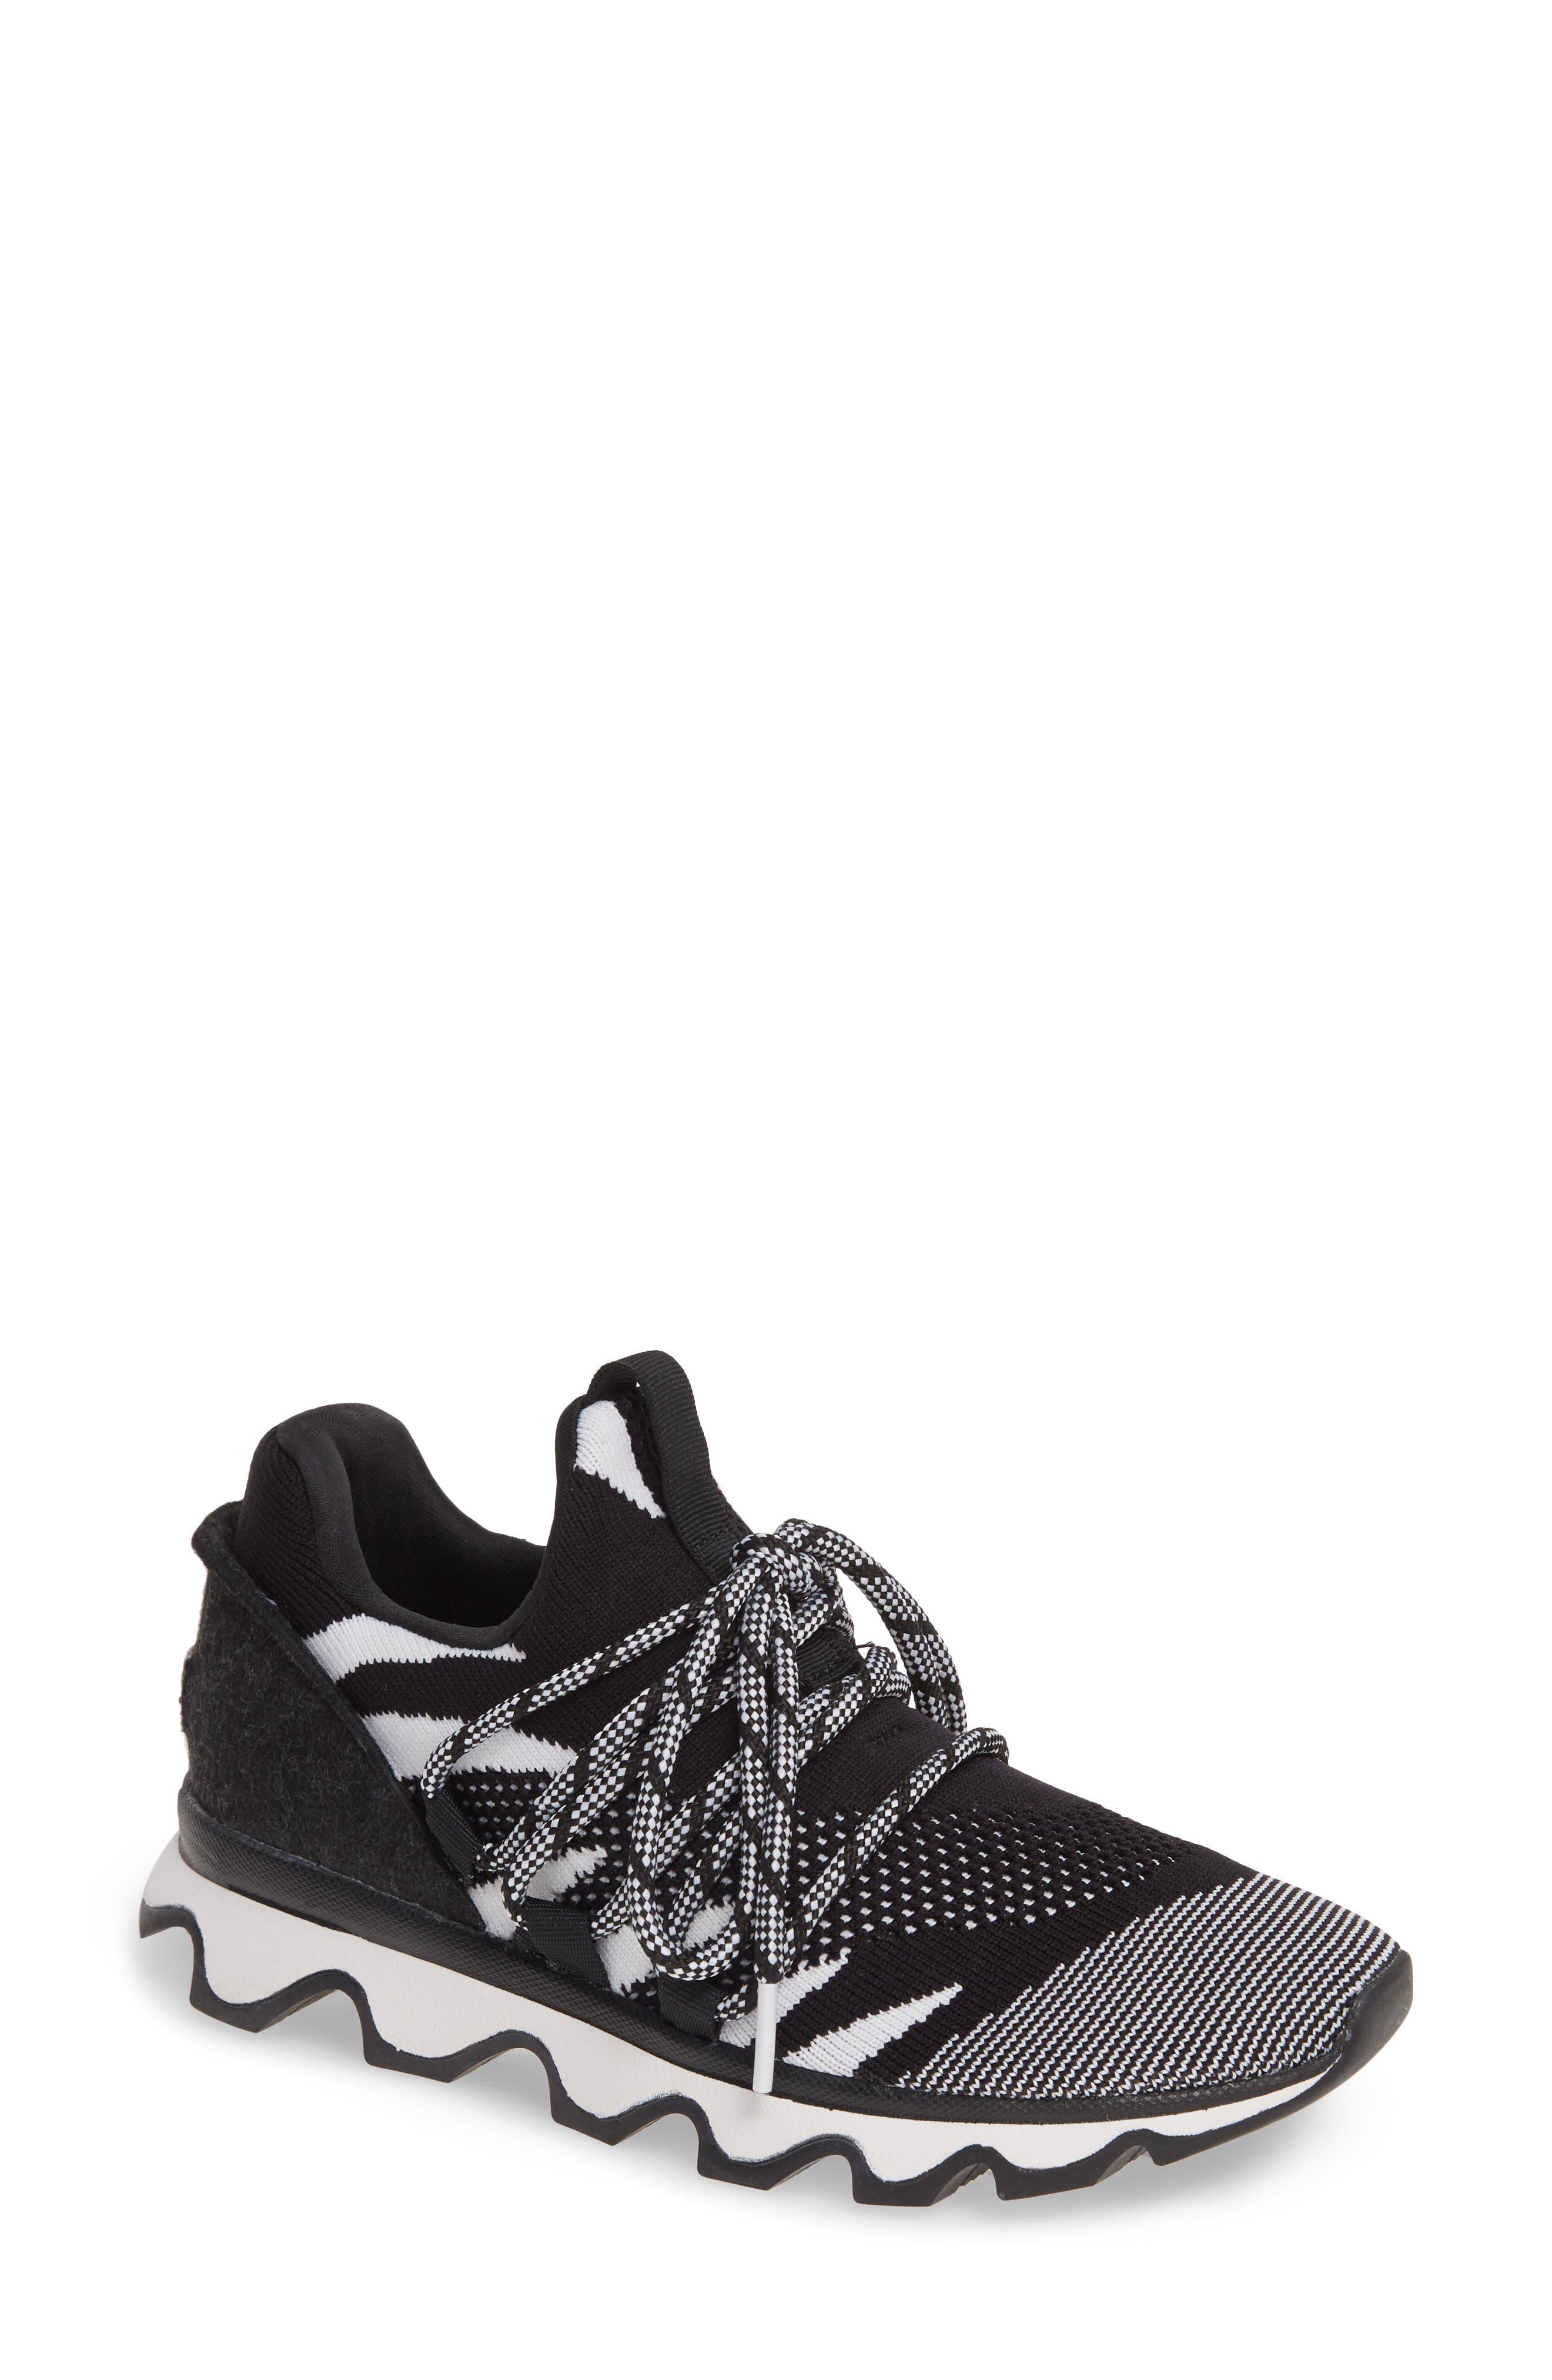 Sorel Kinetic Laces Knit Sneaker